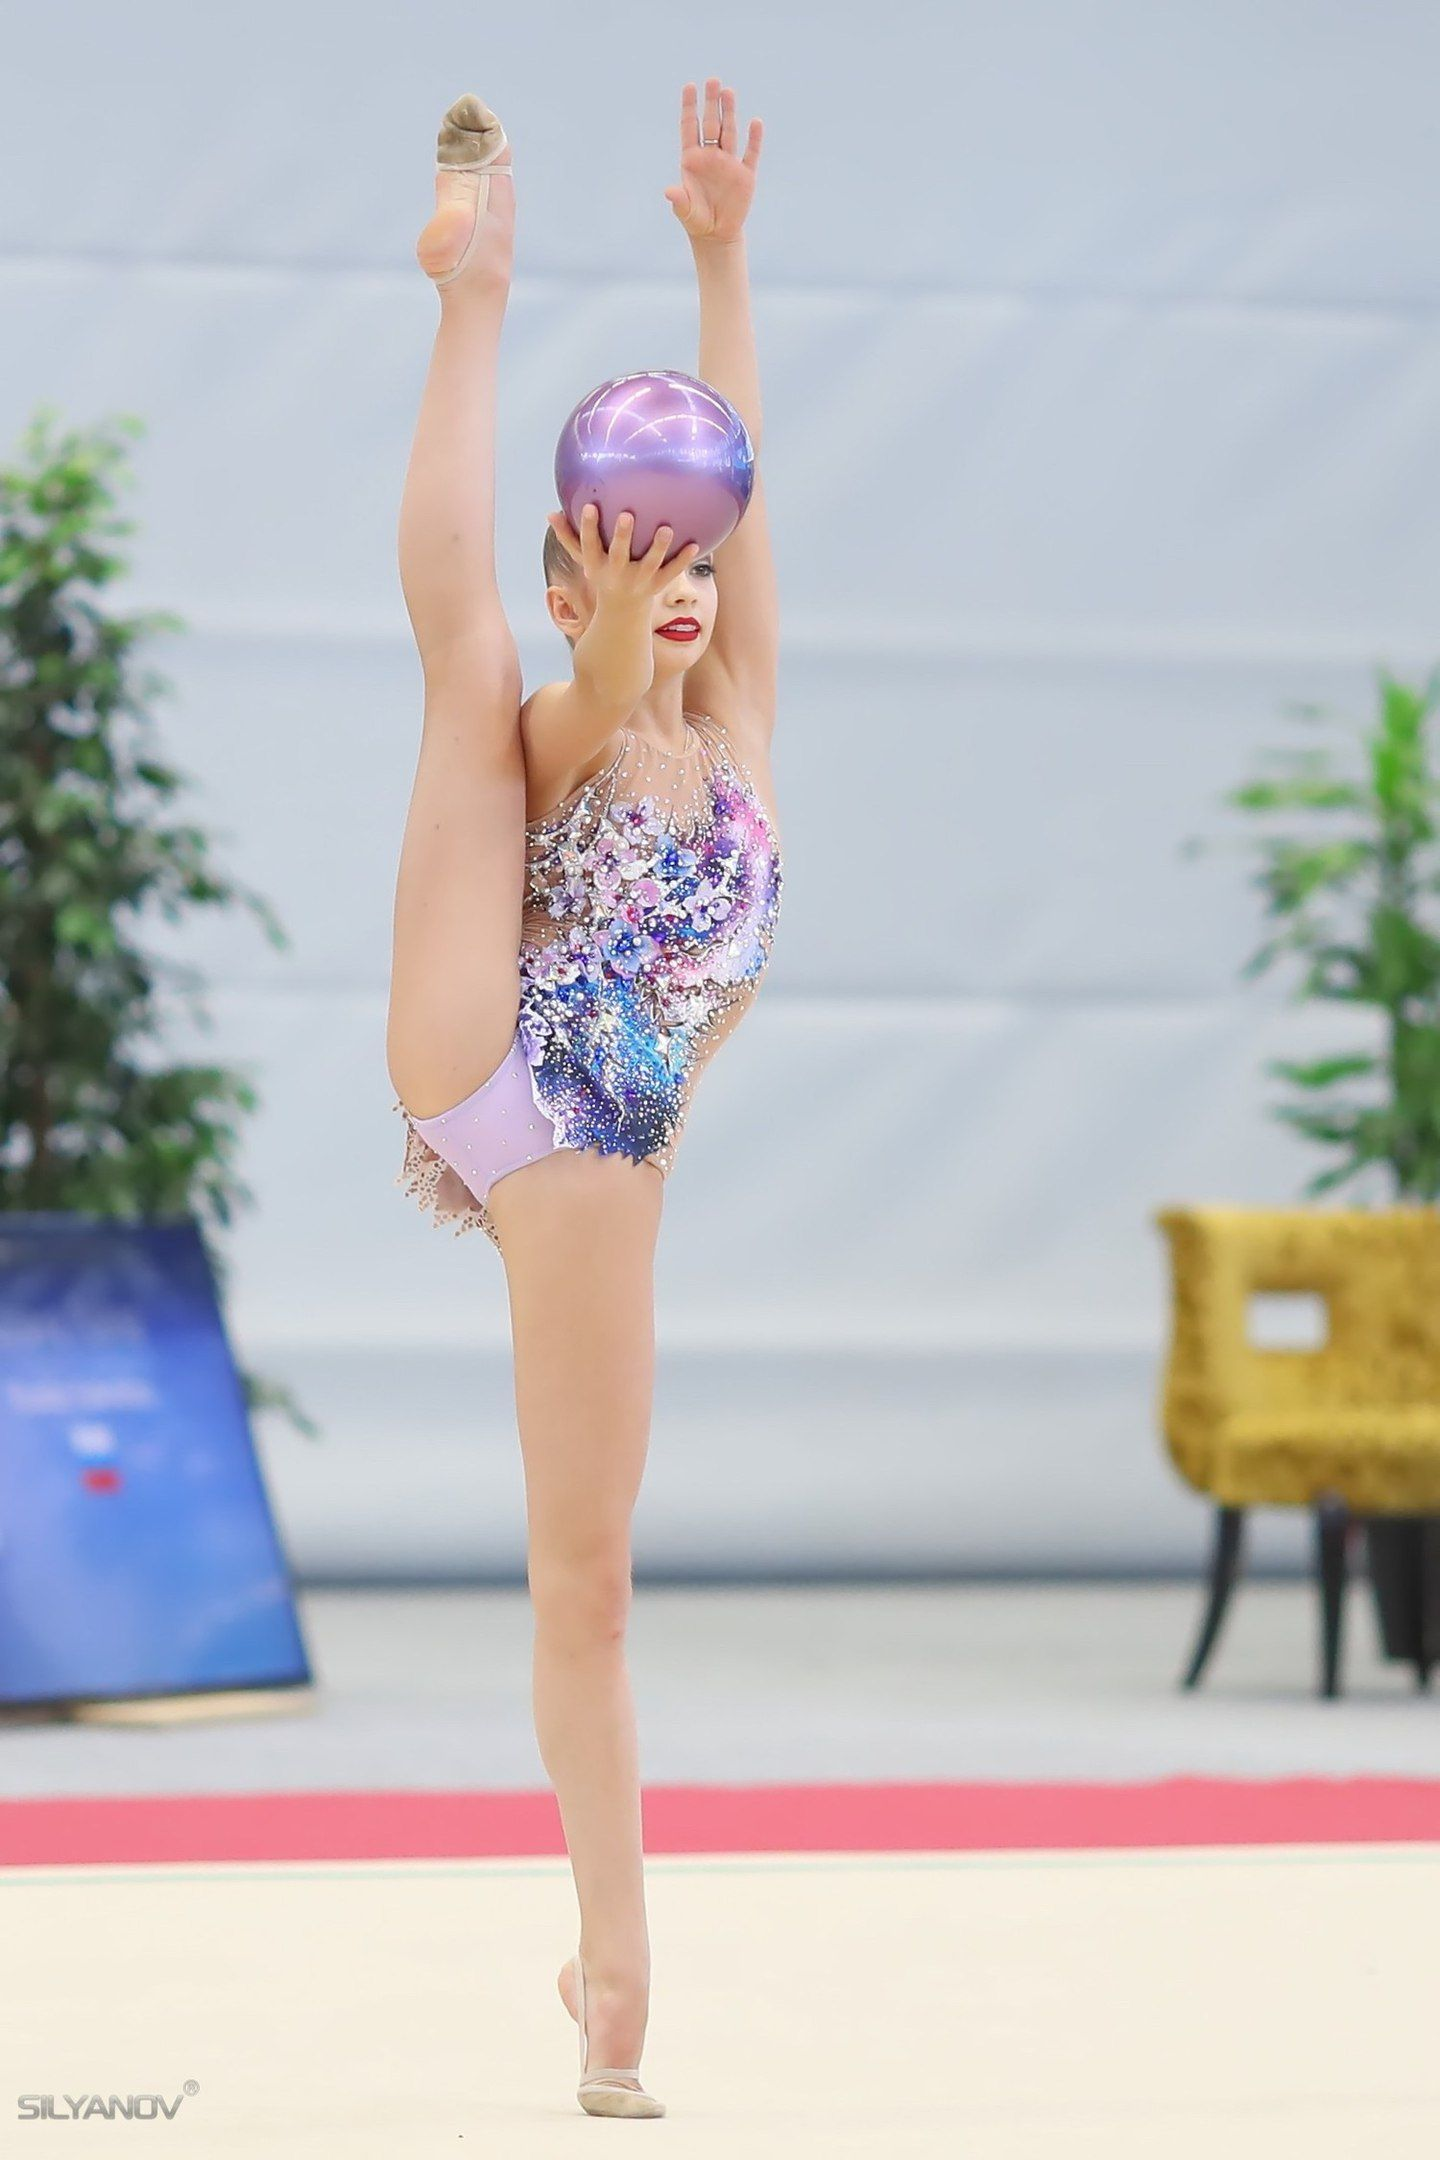 Polina Orlova (Russia), Luxembourg Trophy 2017